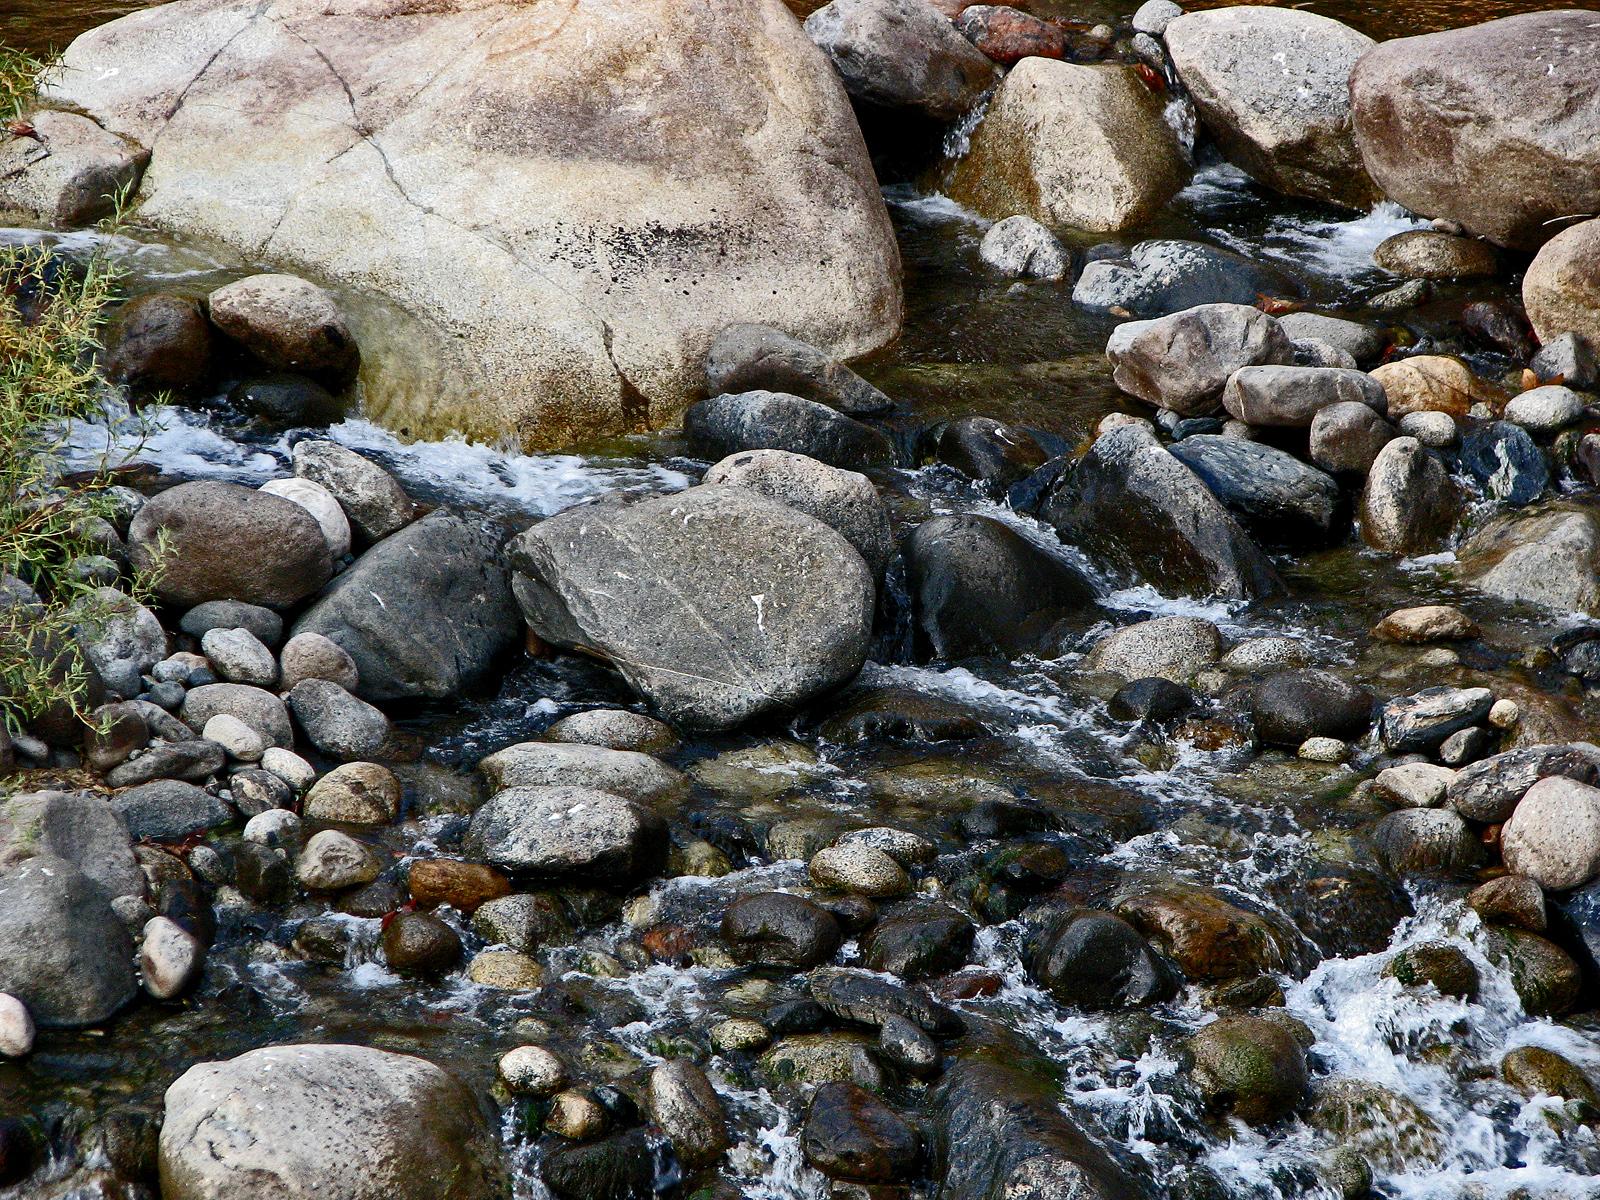 Trickling Over the Rocks, Boulders, Bspo06, Flowing, Foam, HQ Photo